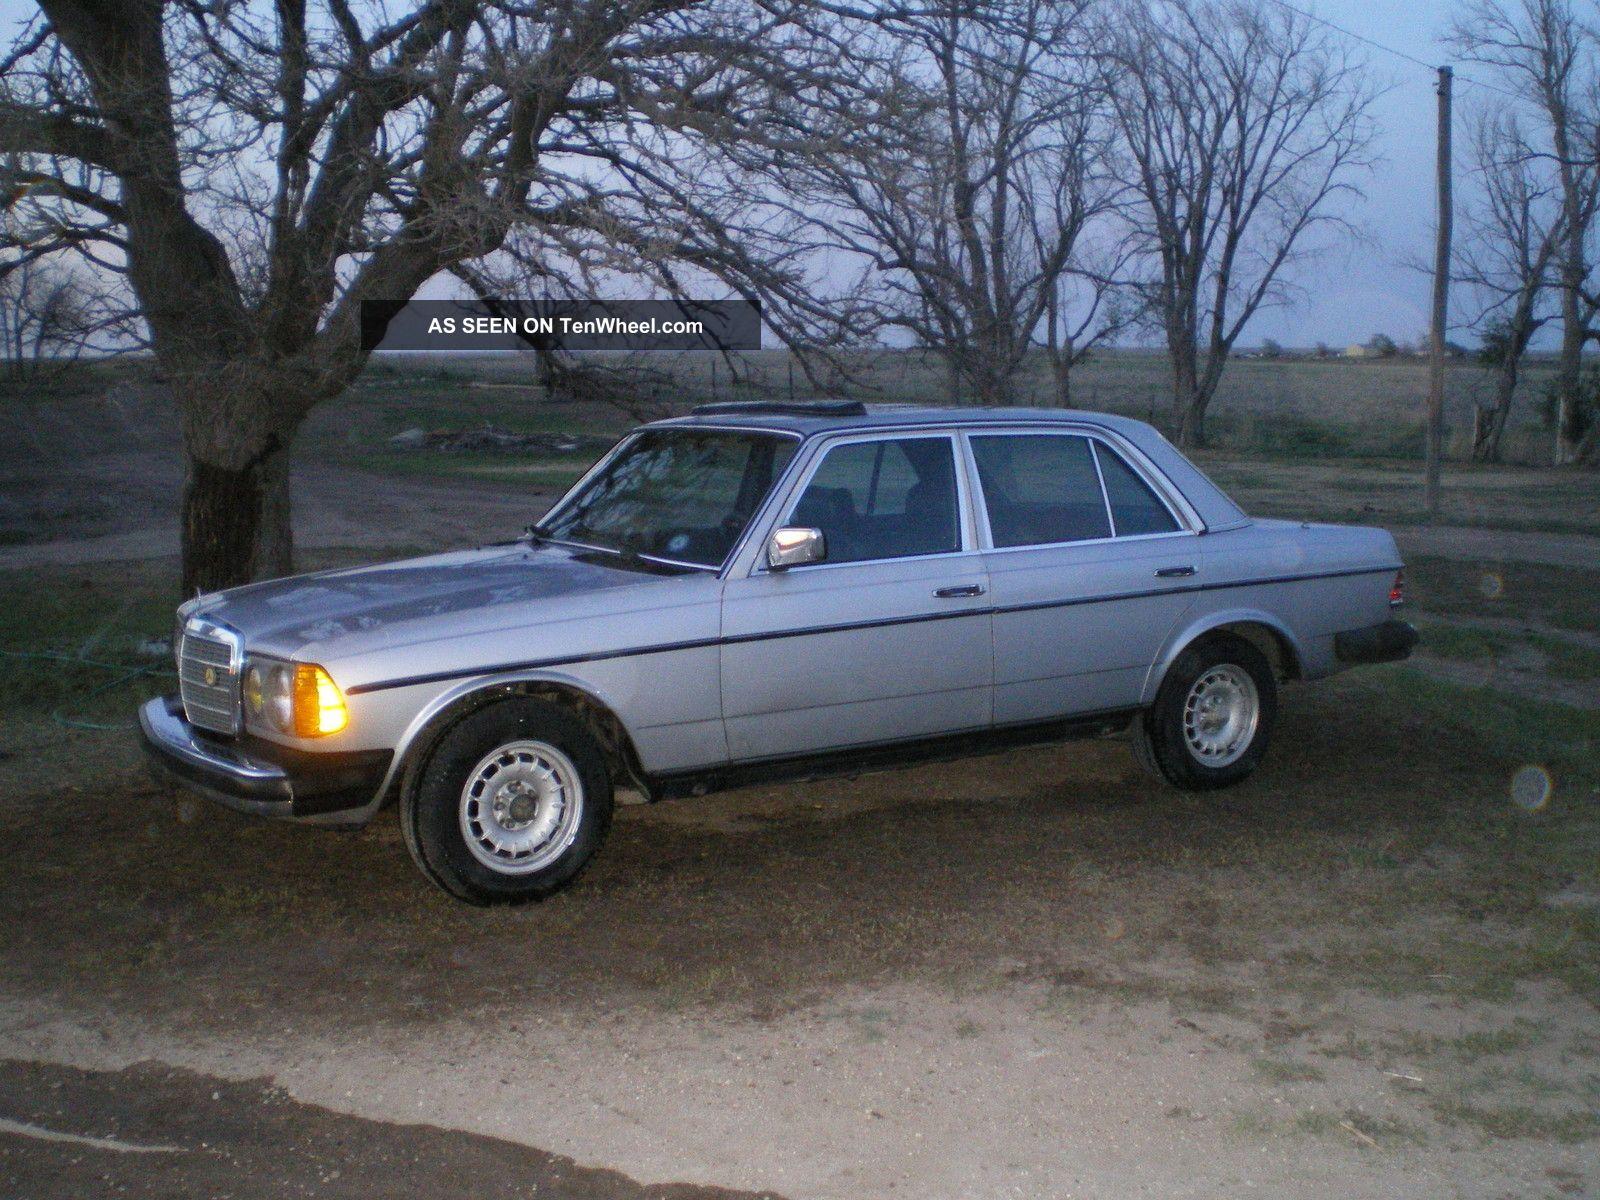 1982 mercedes turbo diesel 300d luxury car. Black Bedroom Furniture Sets. Home Design Ideas